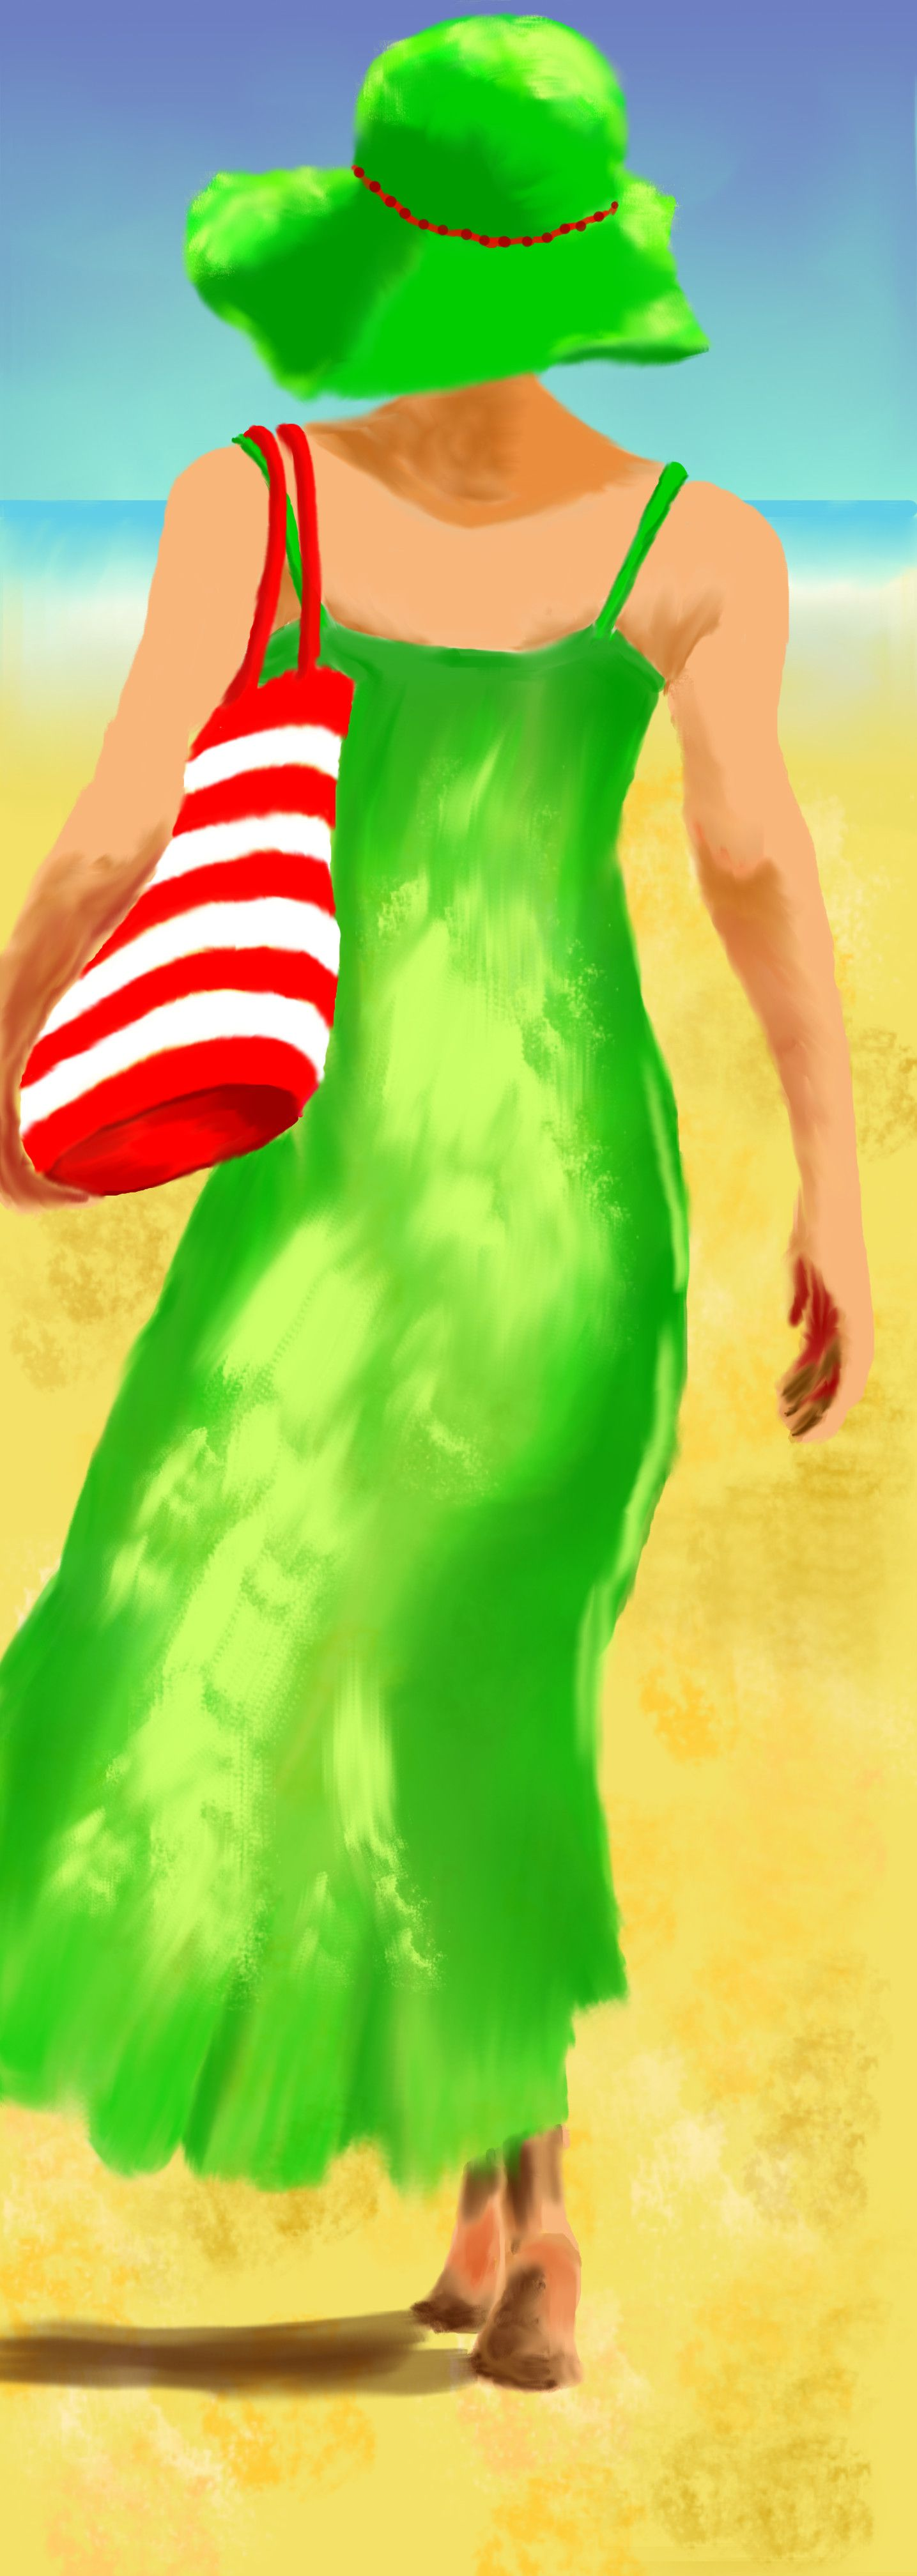 Frau Am Strand Digitale Malerei Gimp Mit Bildern Bilder